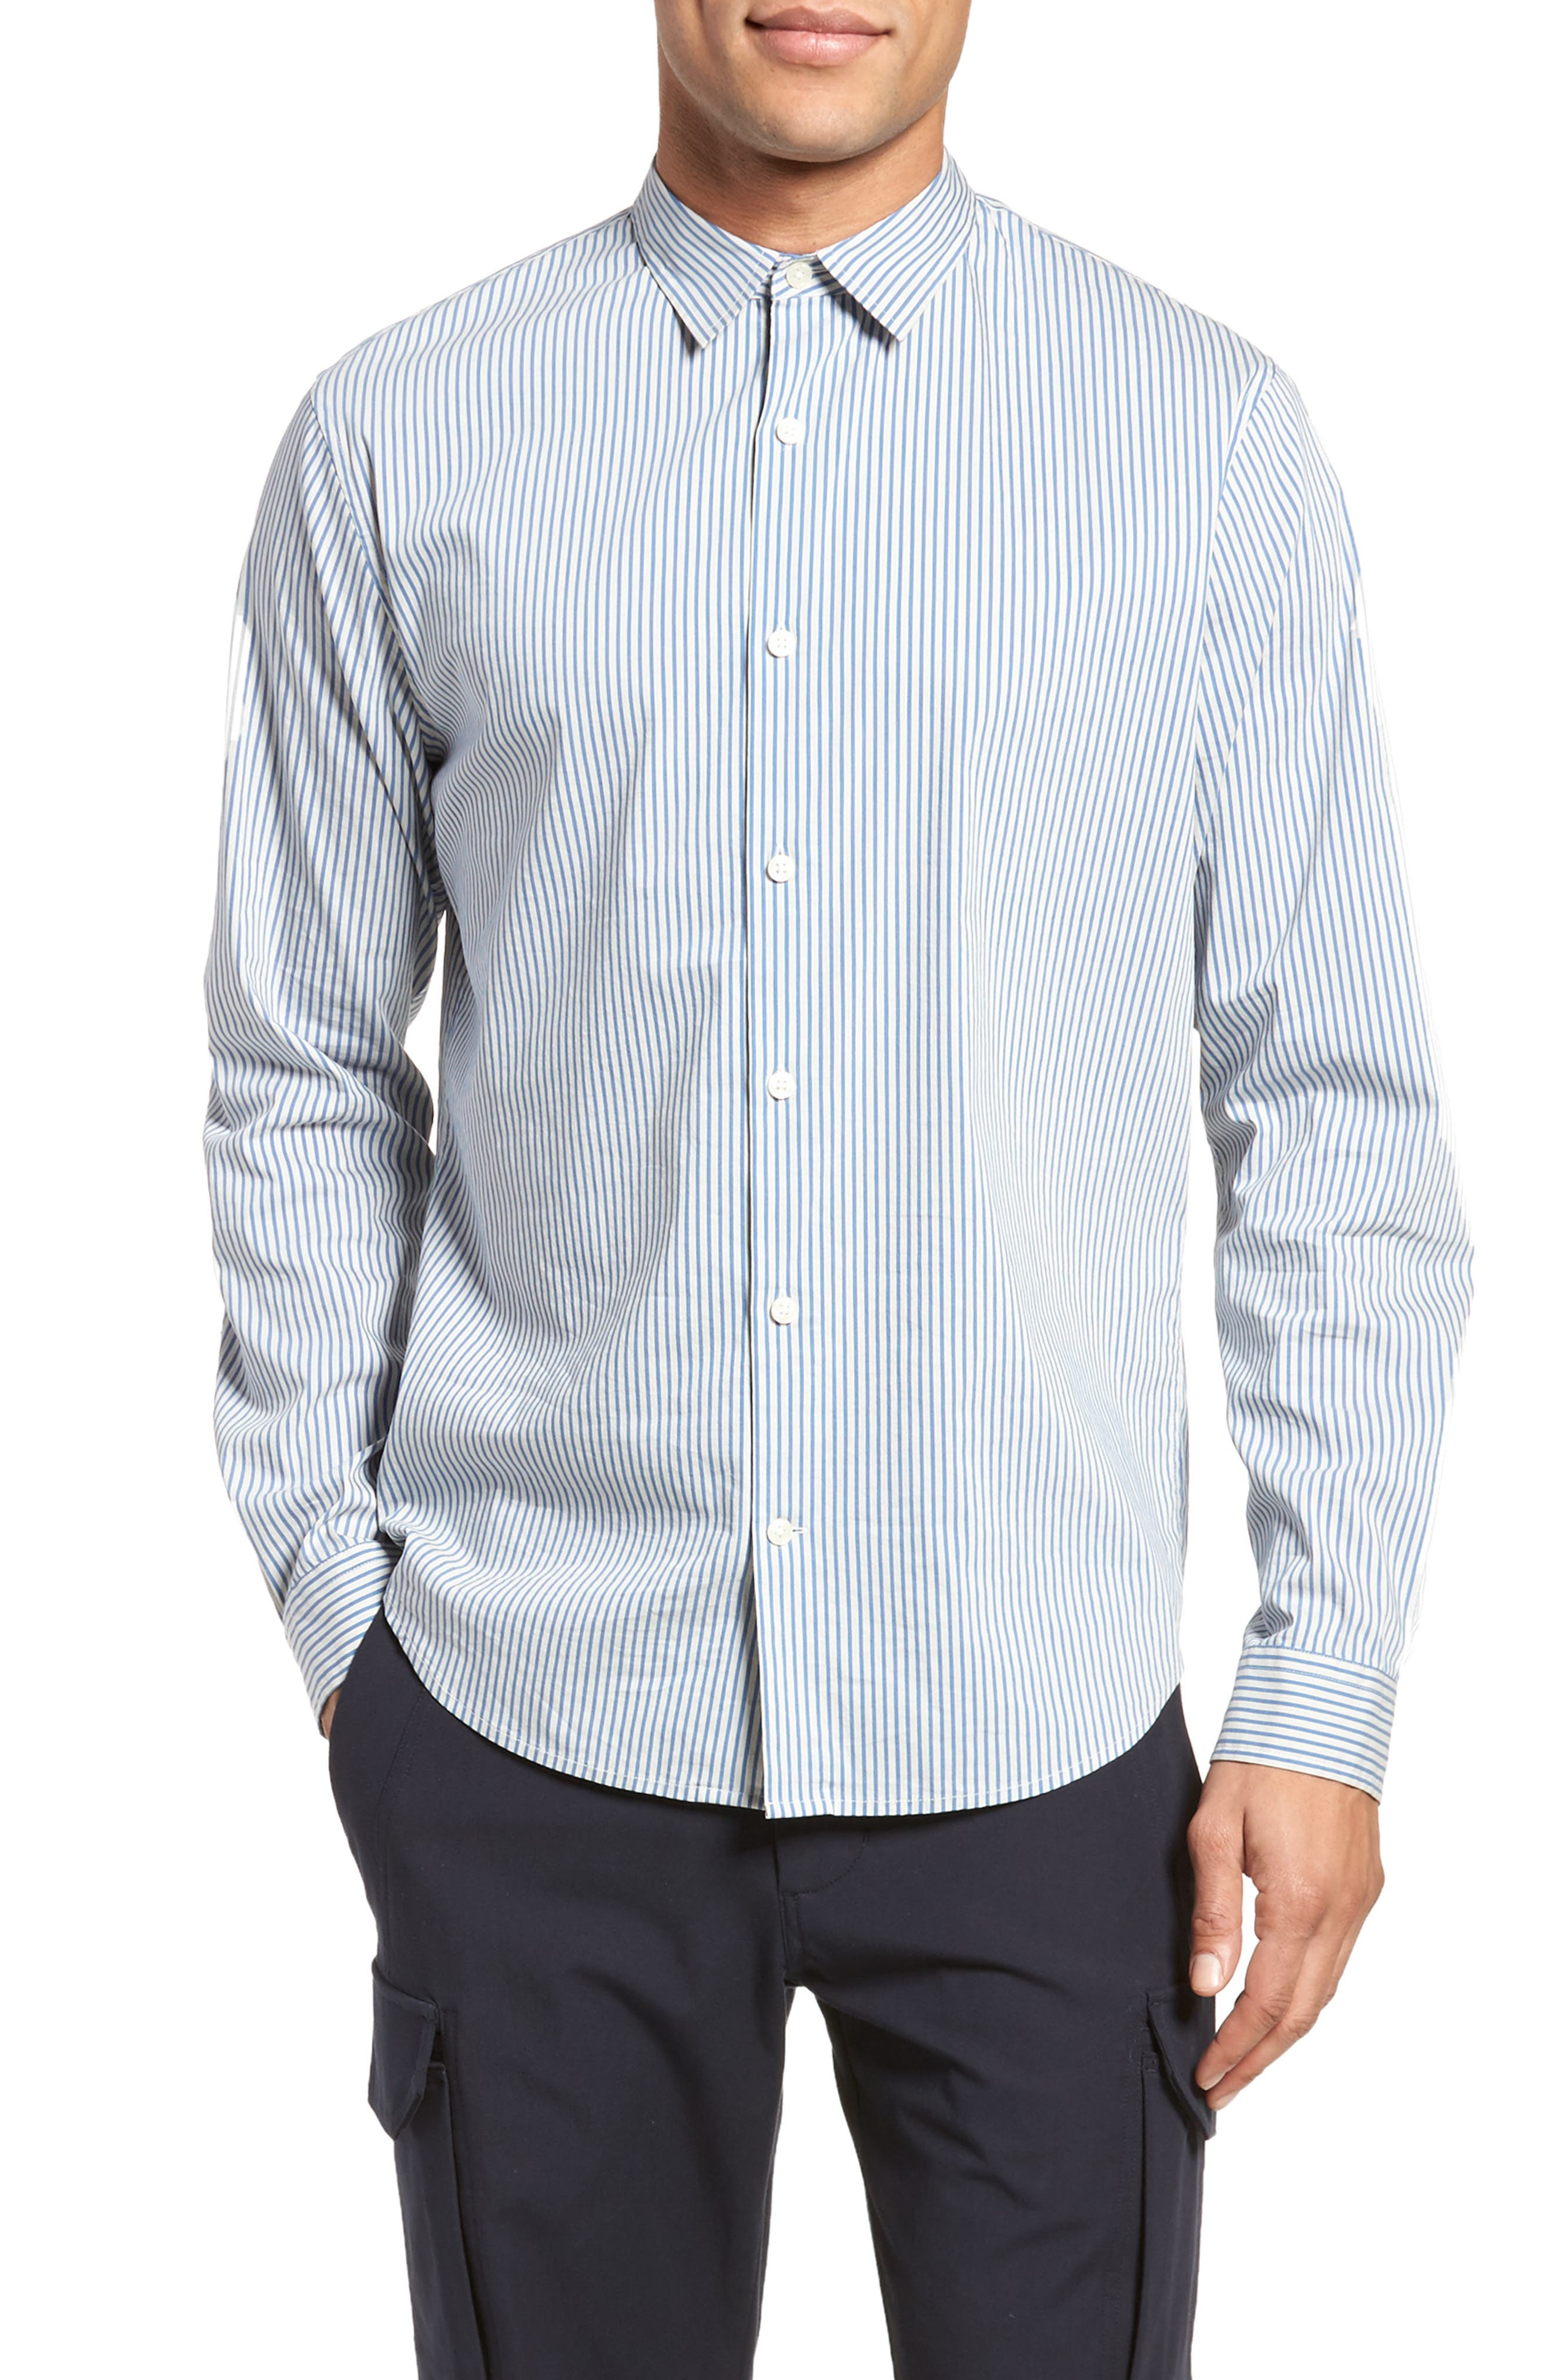 Regular Fit Stripe Sport Shirt,                             Main thumbnail 1, color,                             White/ Ocean Blue